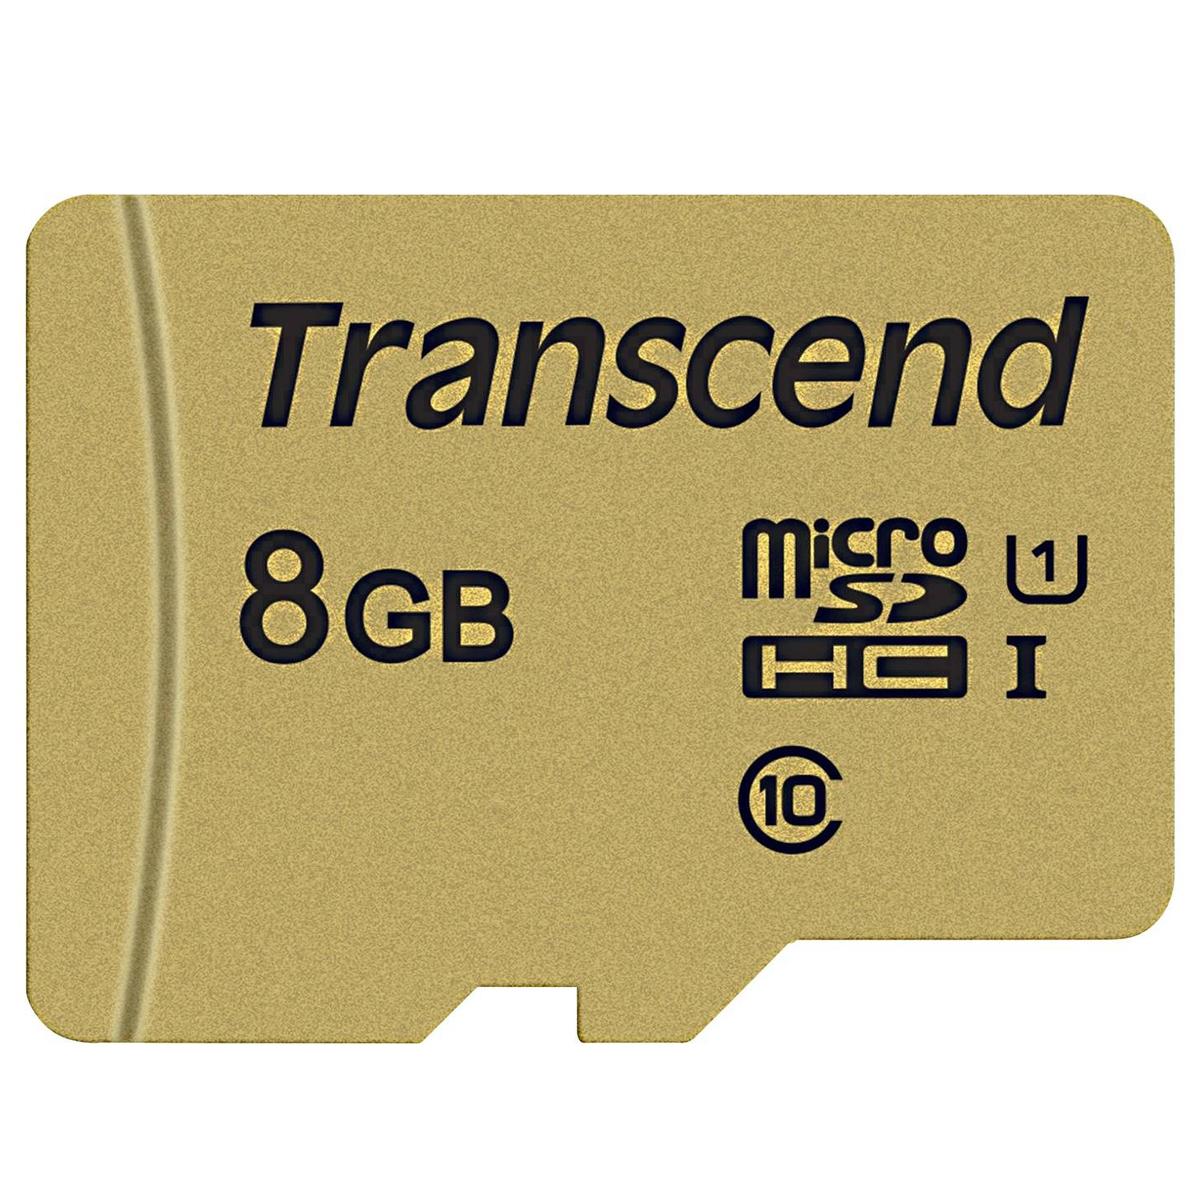 microSDHC Card 8 GB, Speicherkarte